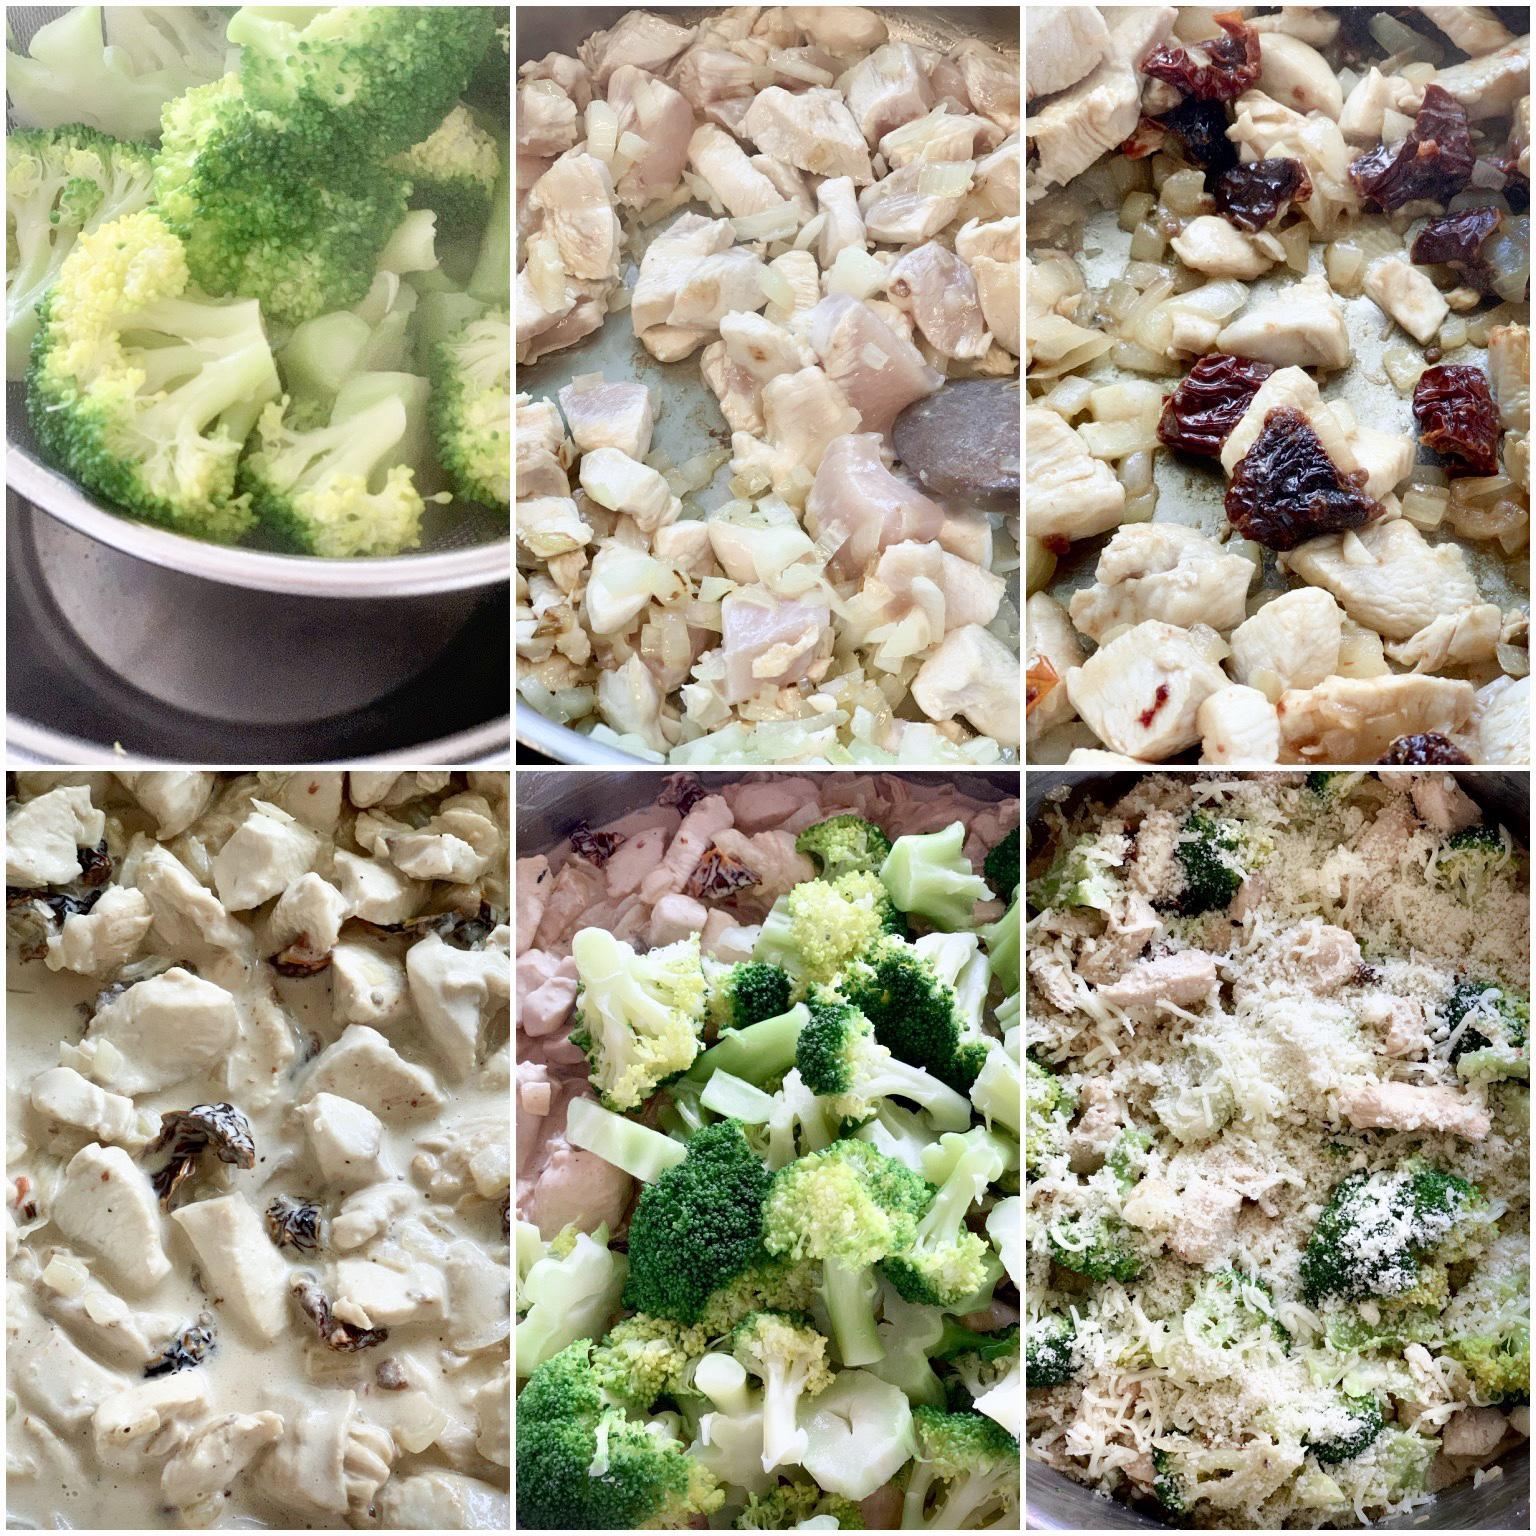 Picture of procedure to prepare broccoli and chicken casserole with mascarpone and dried tomato sauce